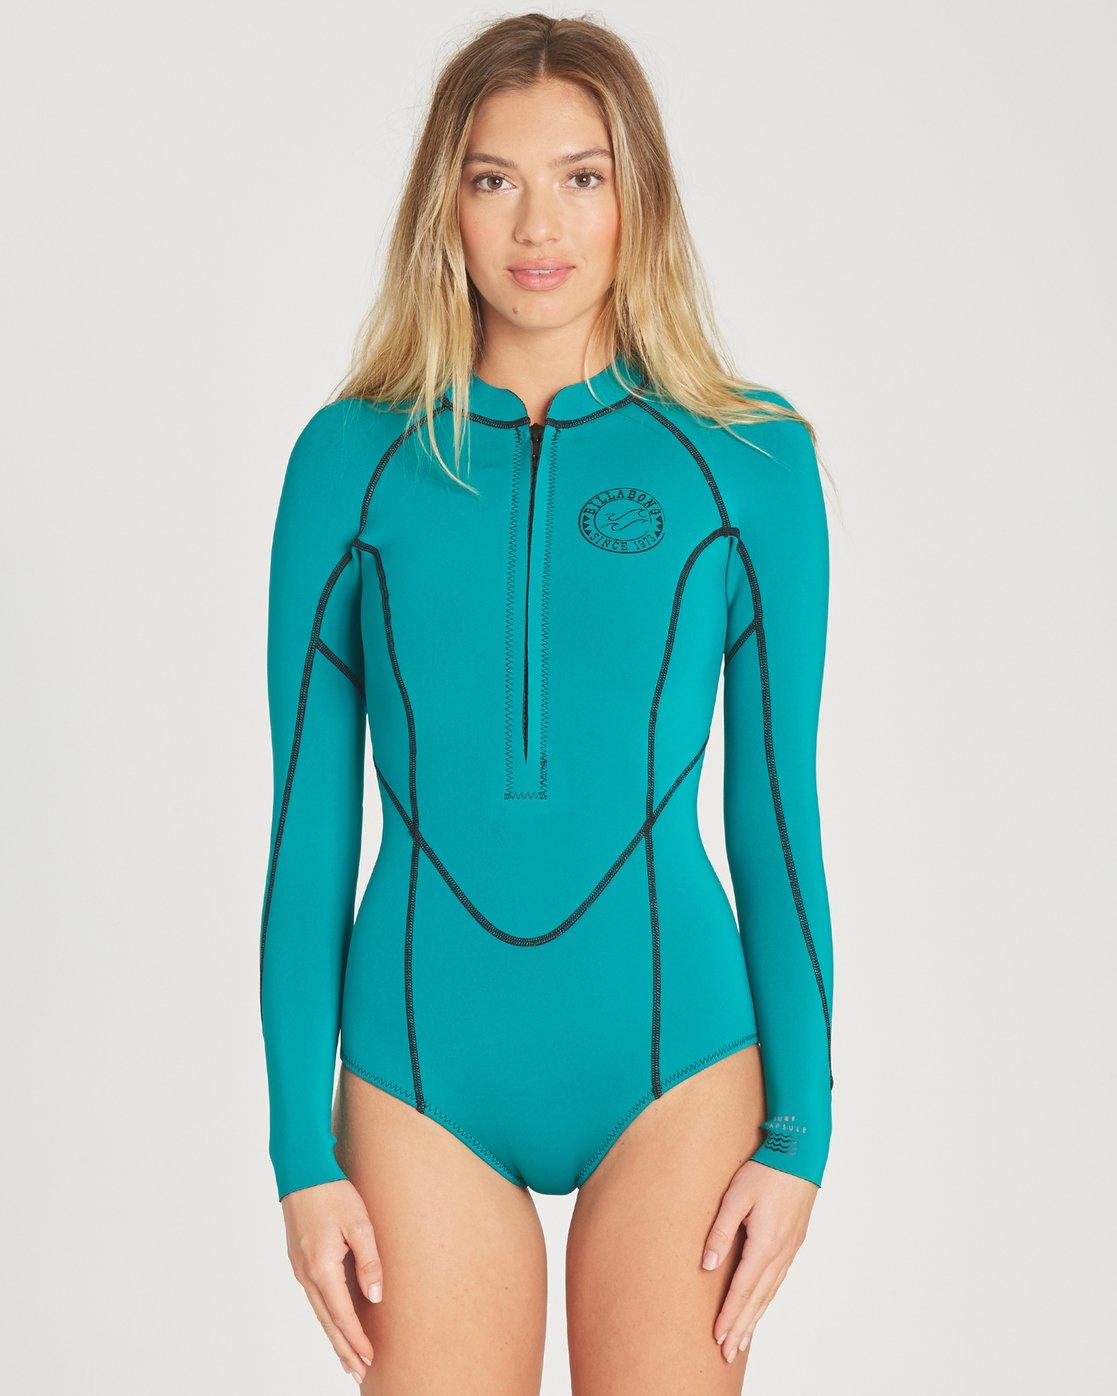 NWT 105$ Billabong Salty Dayz L//s Spring Wetsuit Long sleeves Geometric